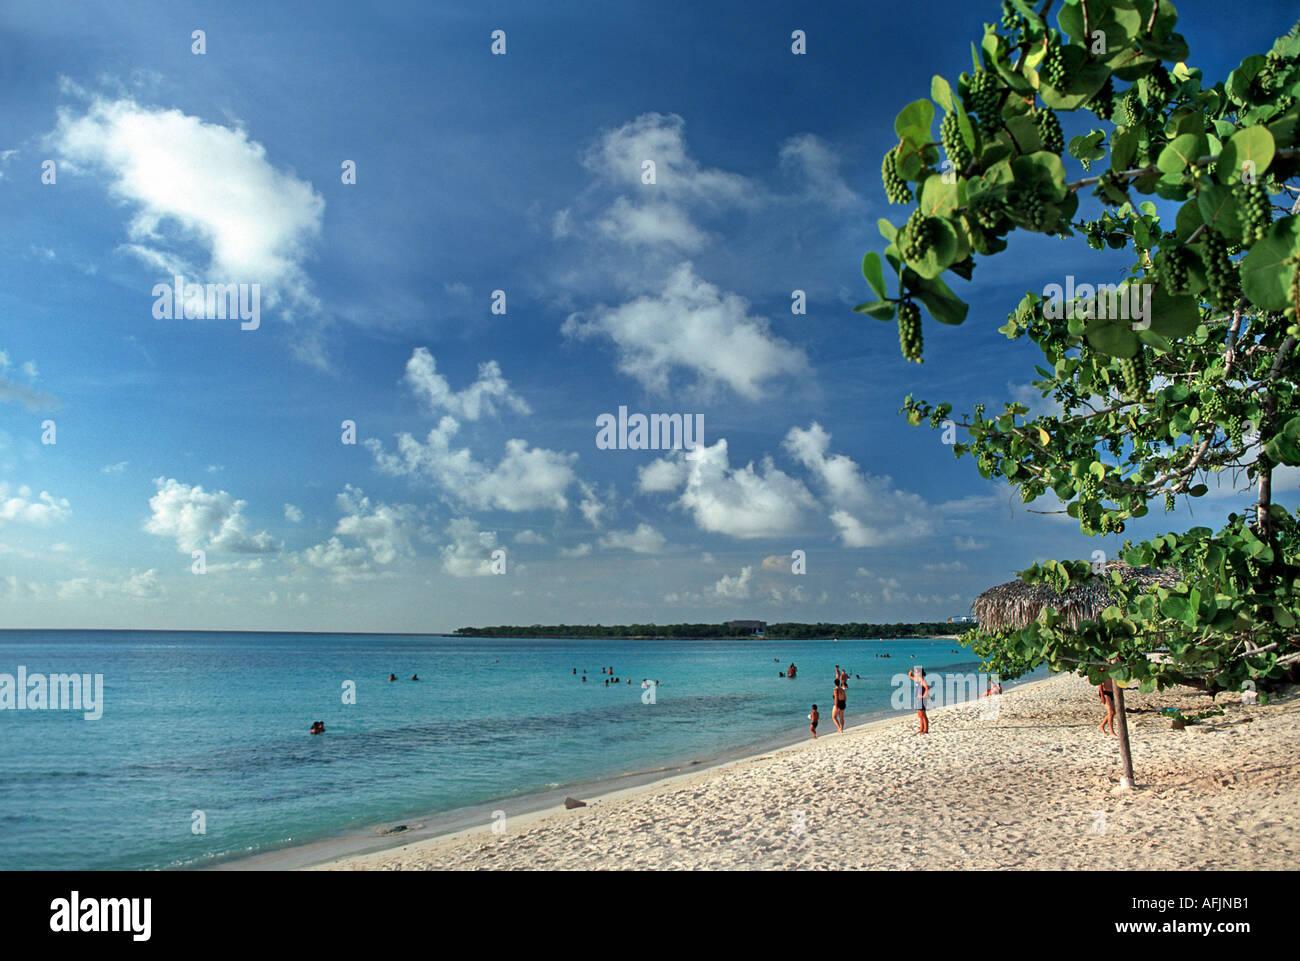 Holidaymakers on the beach at Playa Pesquero Guardalavaca Holguin Cuba - Stock Image